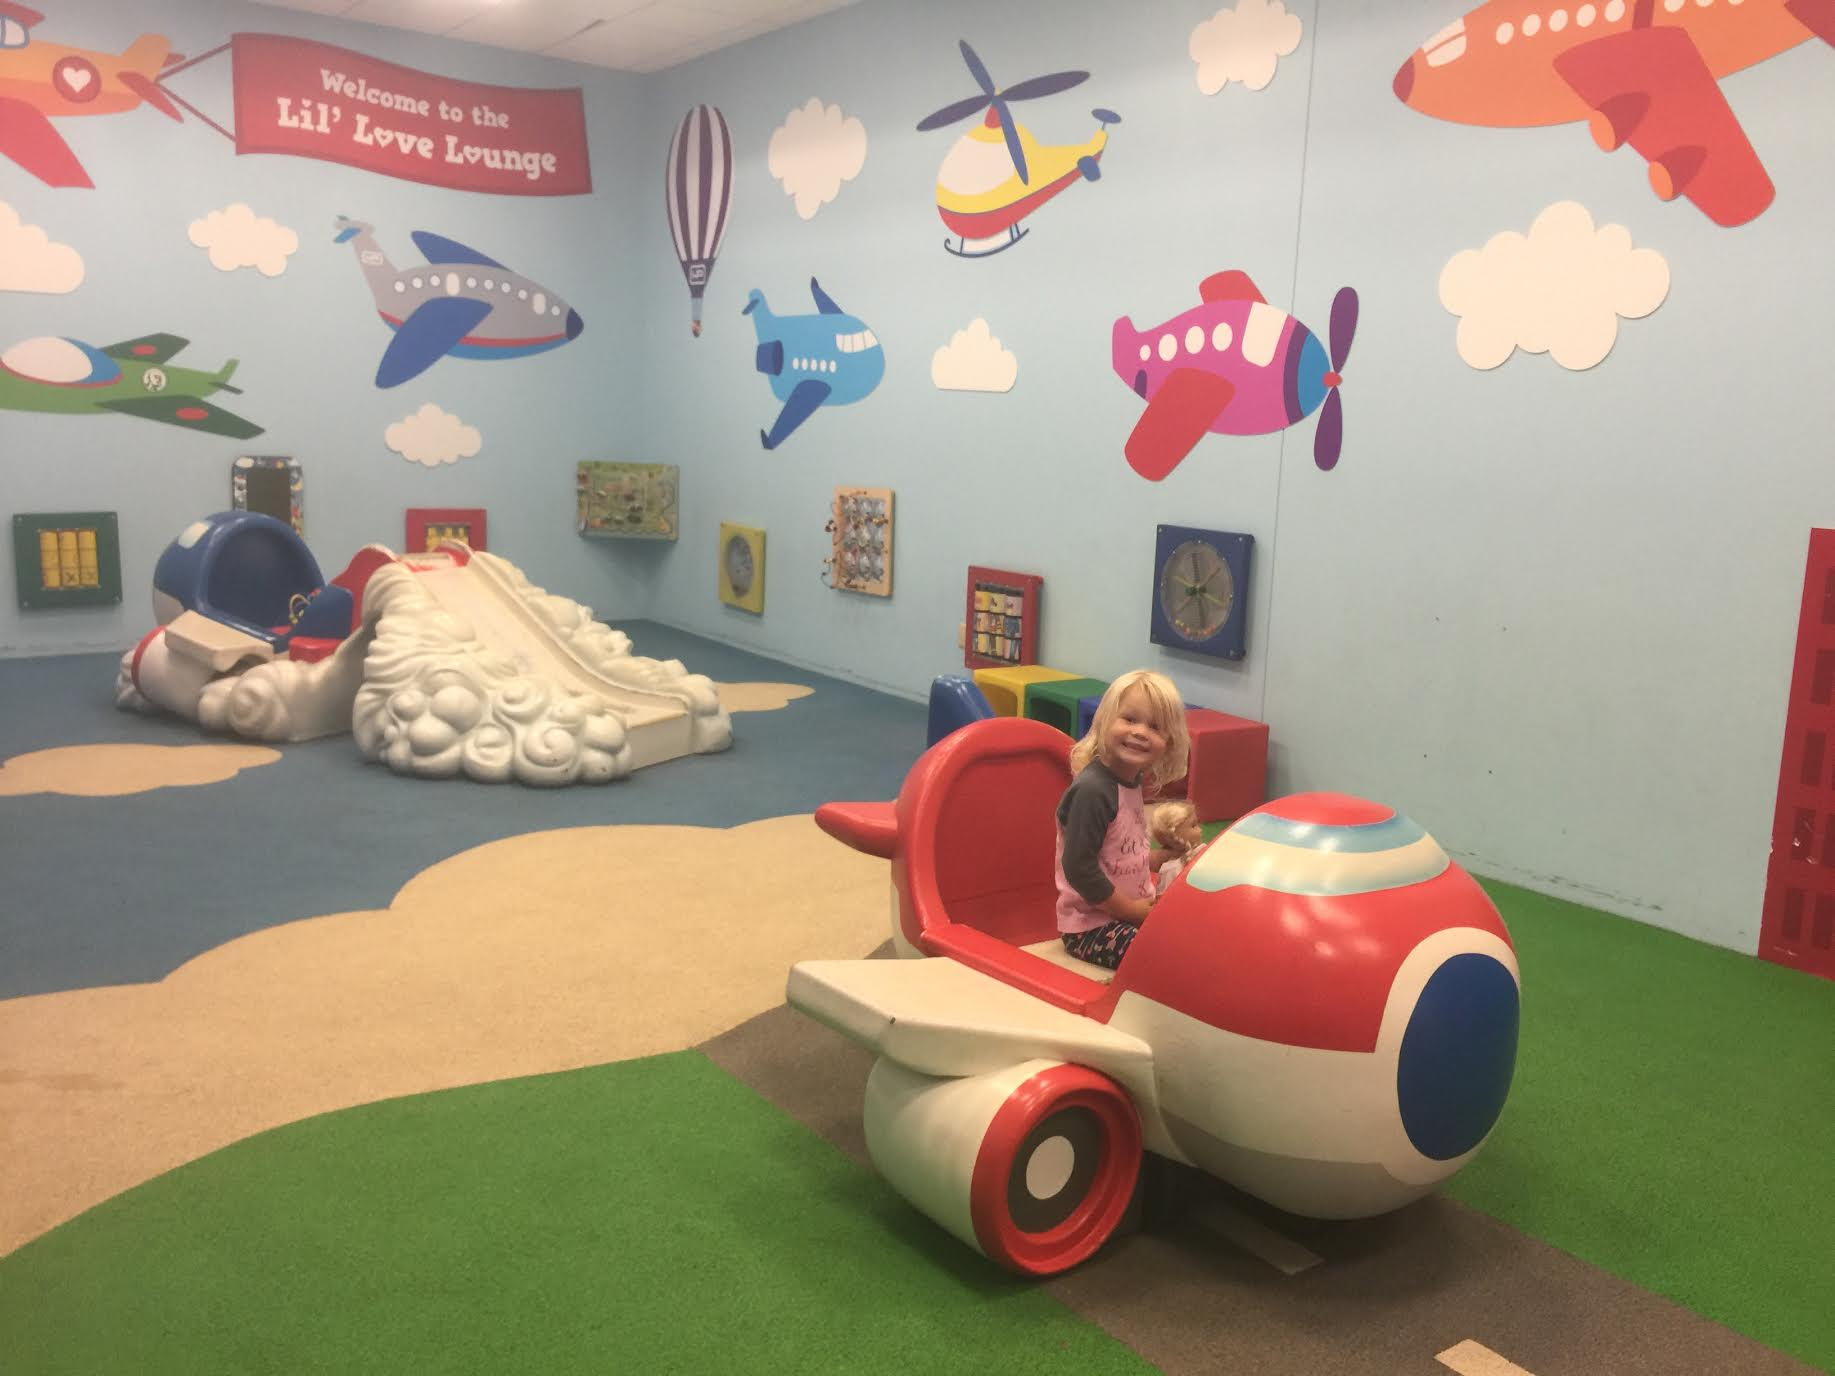 airport-play-area-dallas